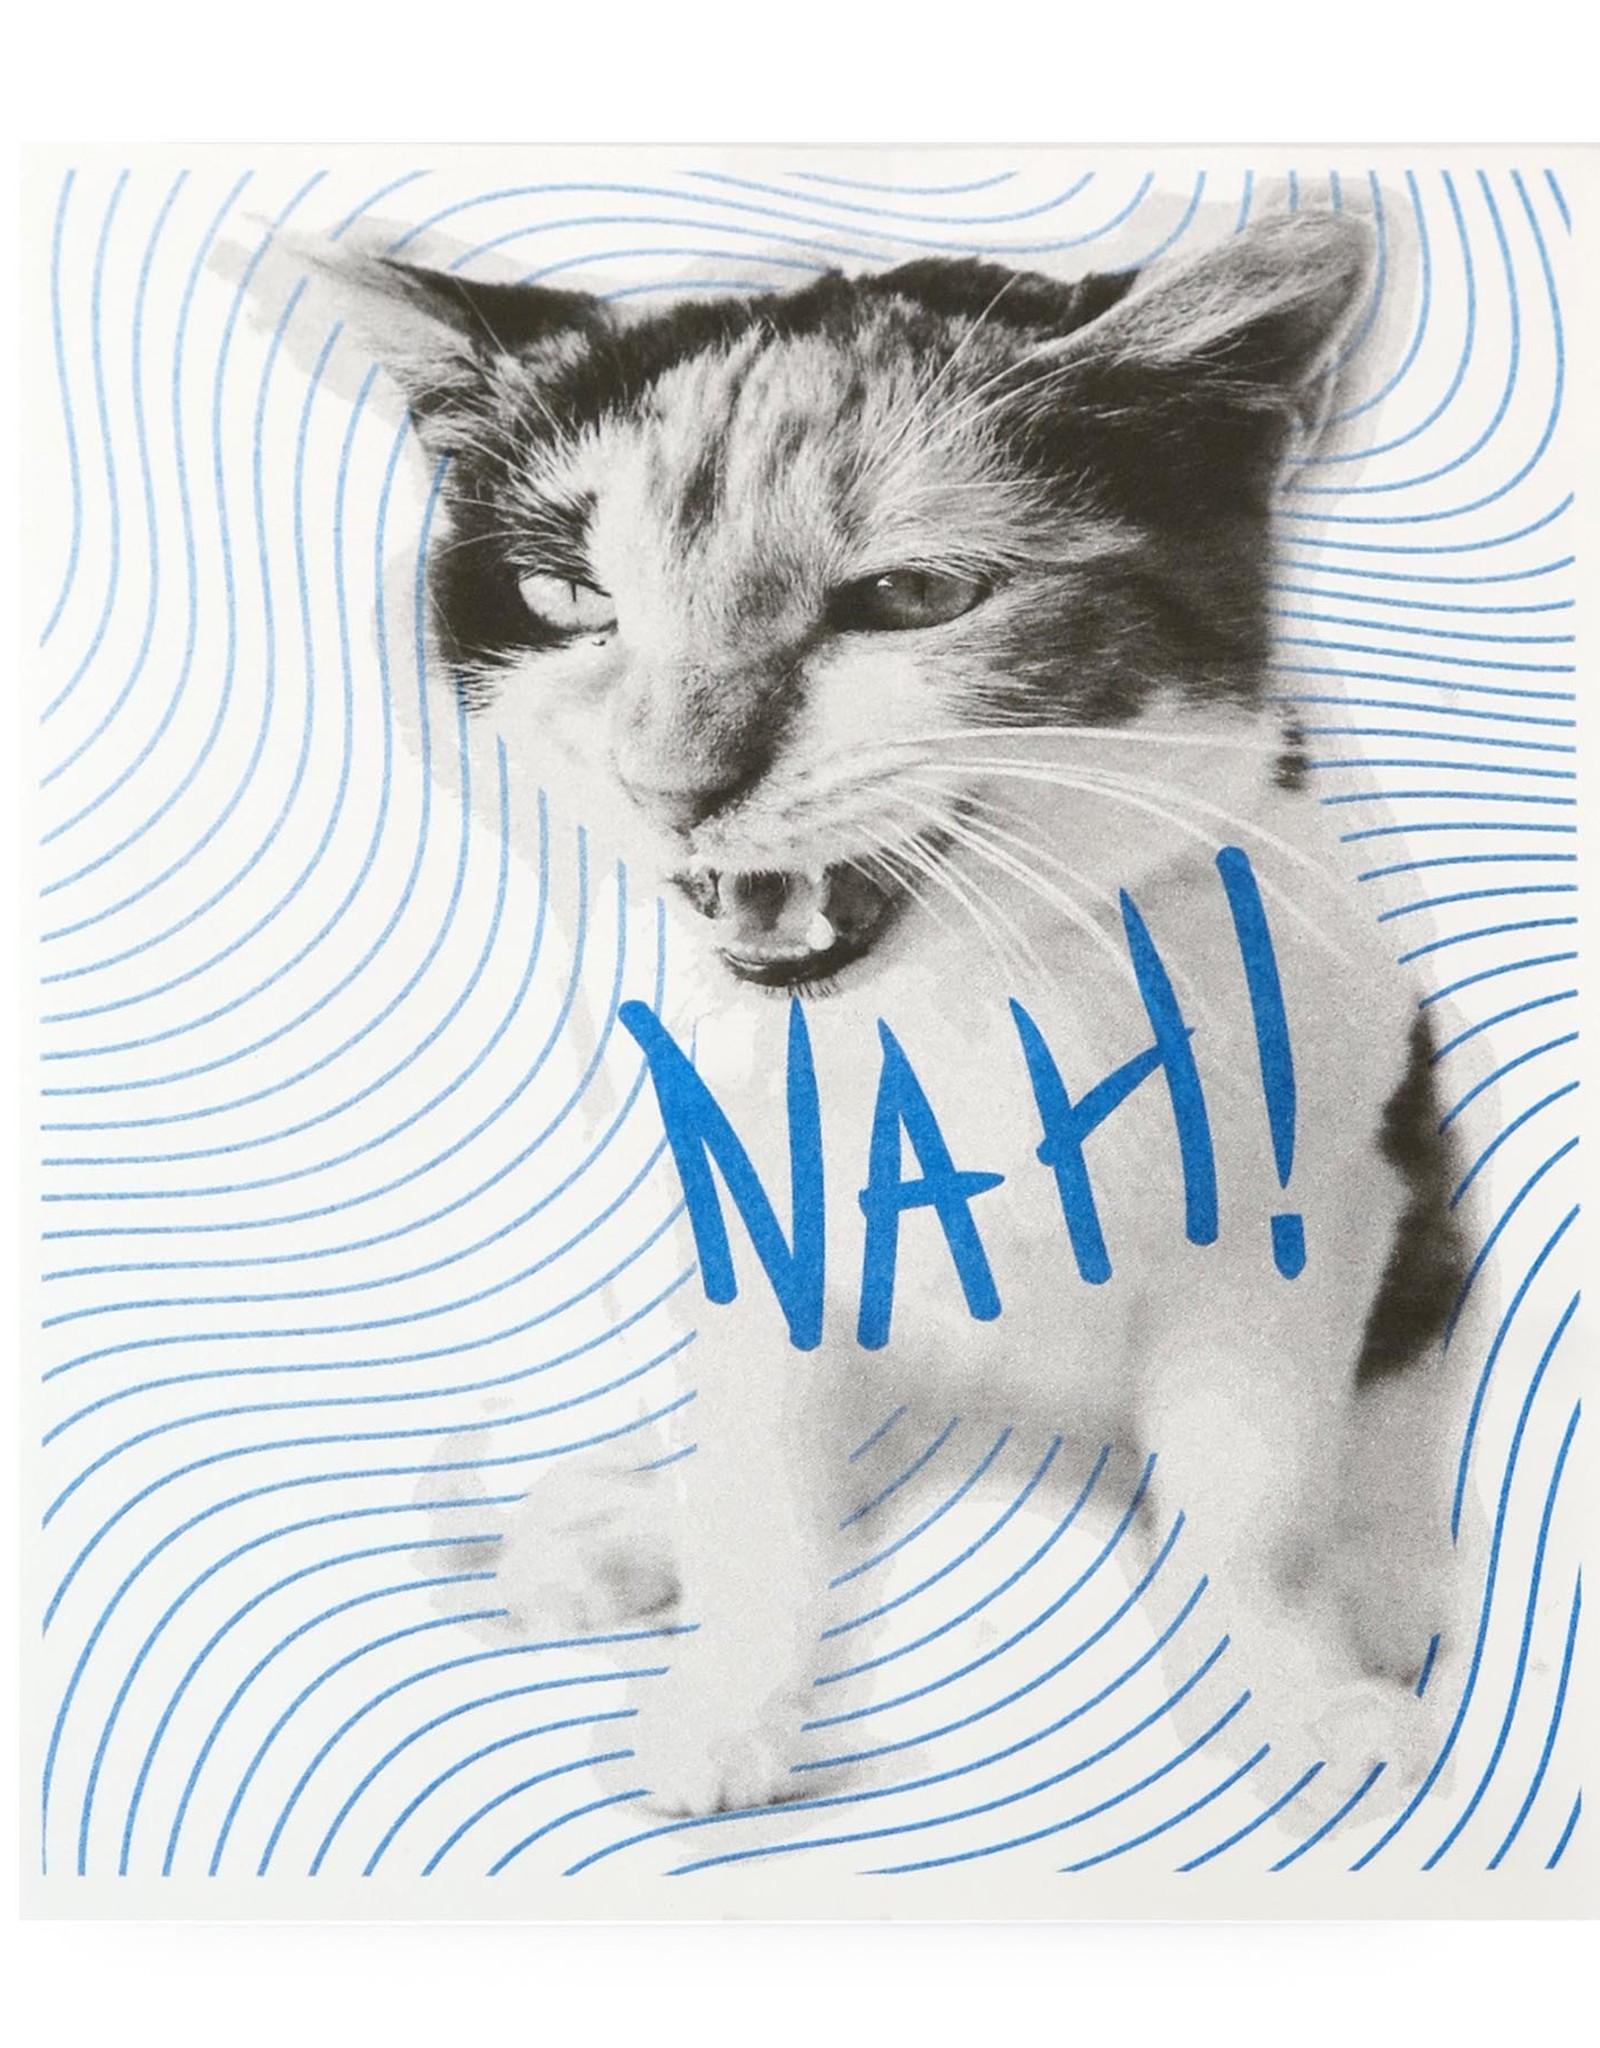 """NAH!"" by Sidney Trobee"